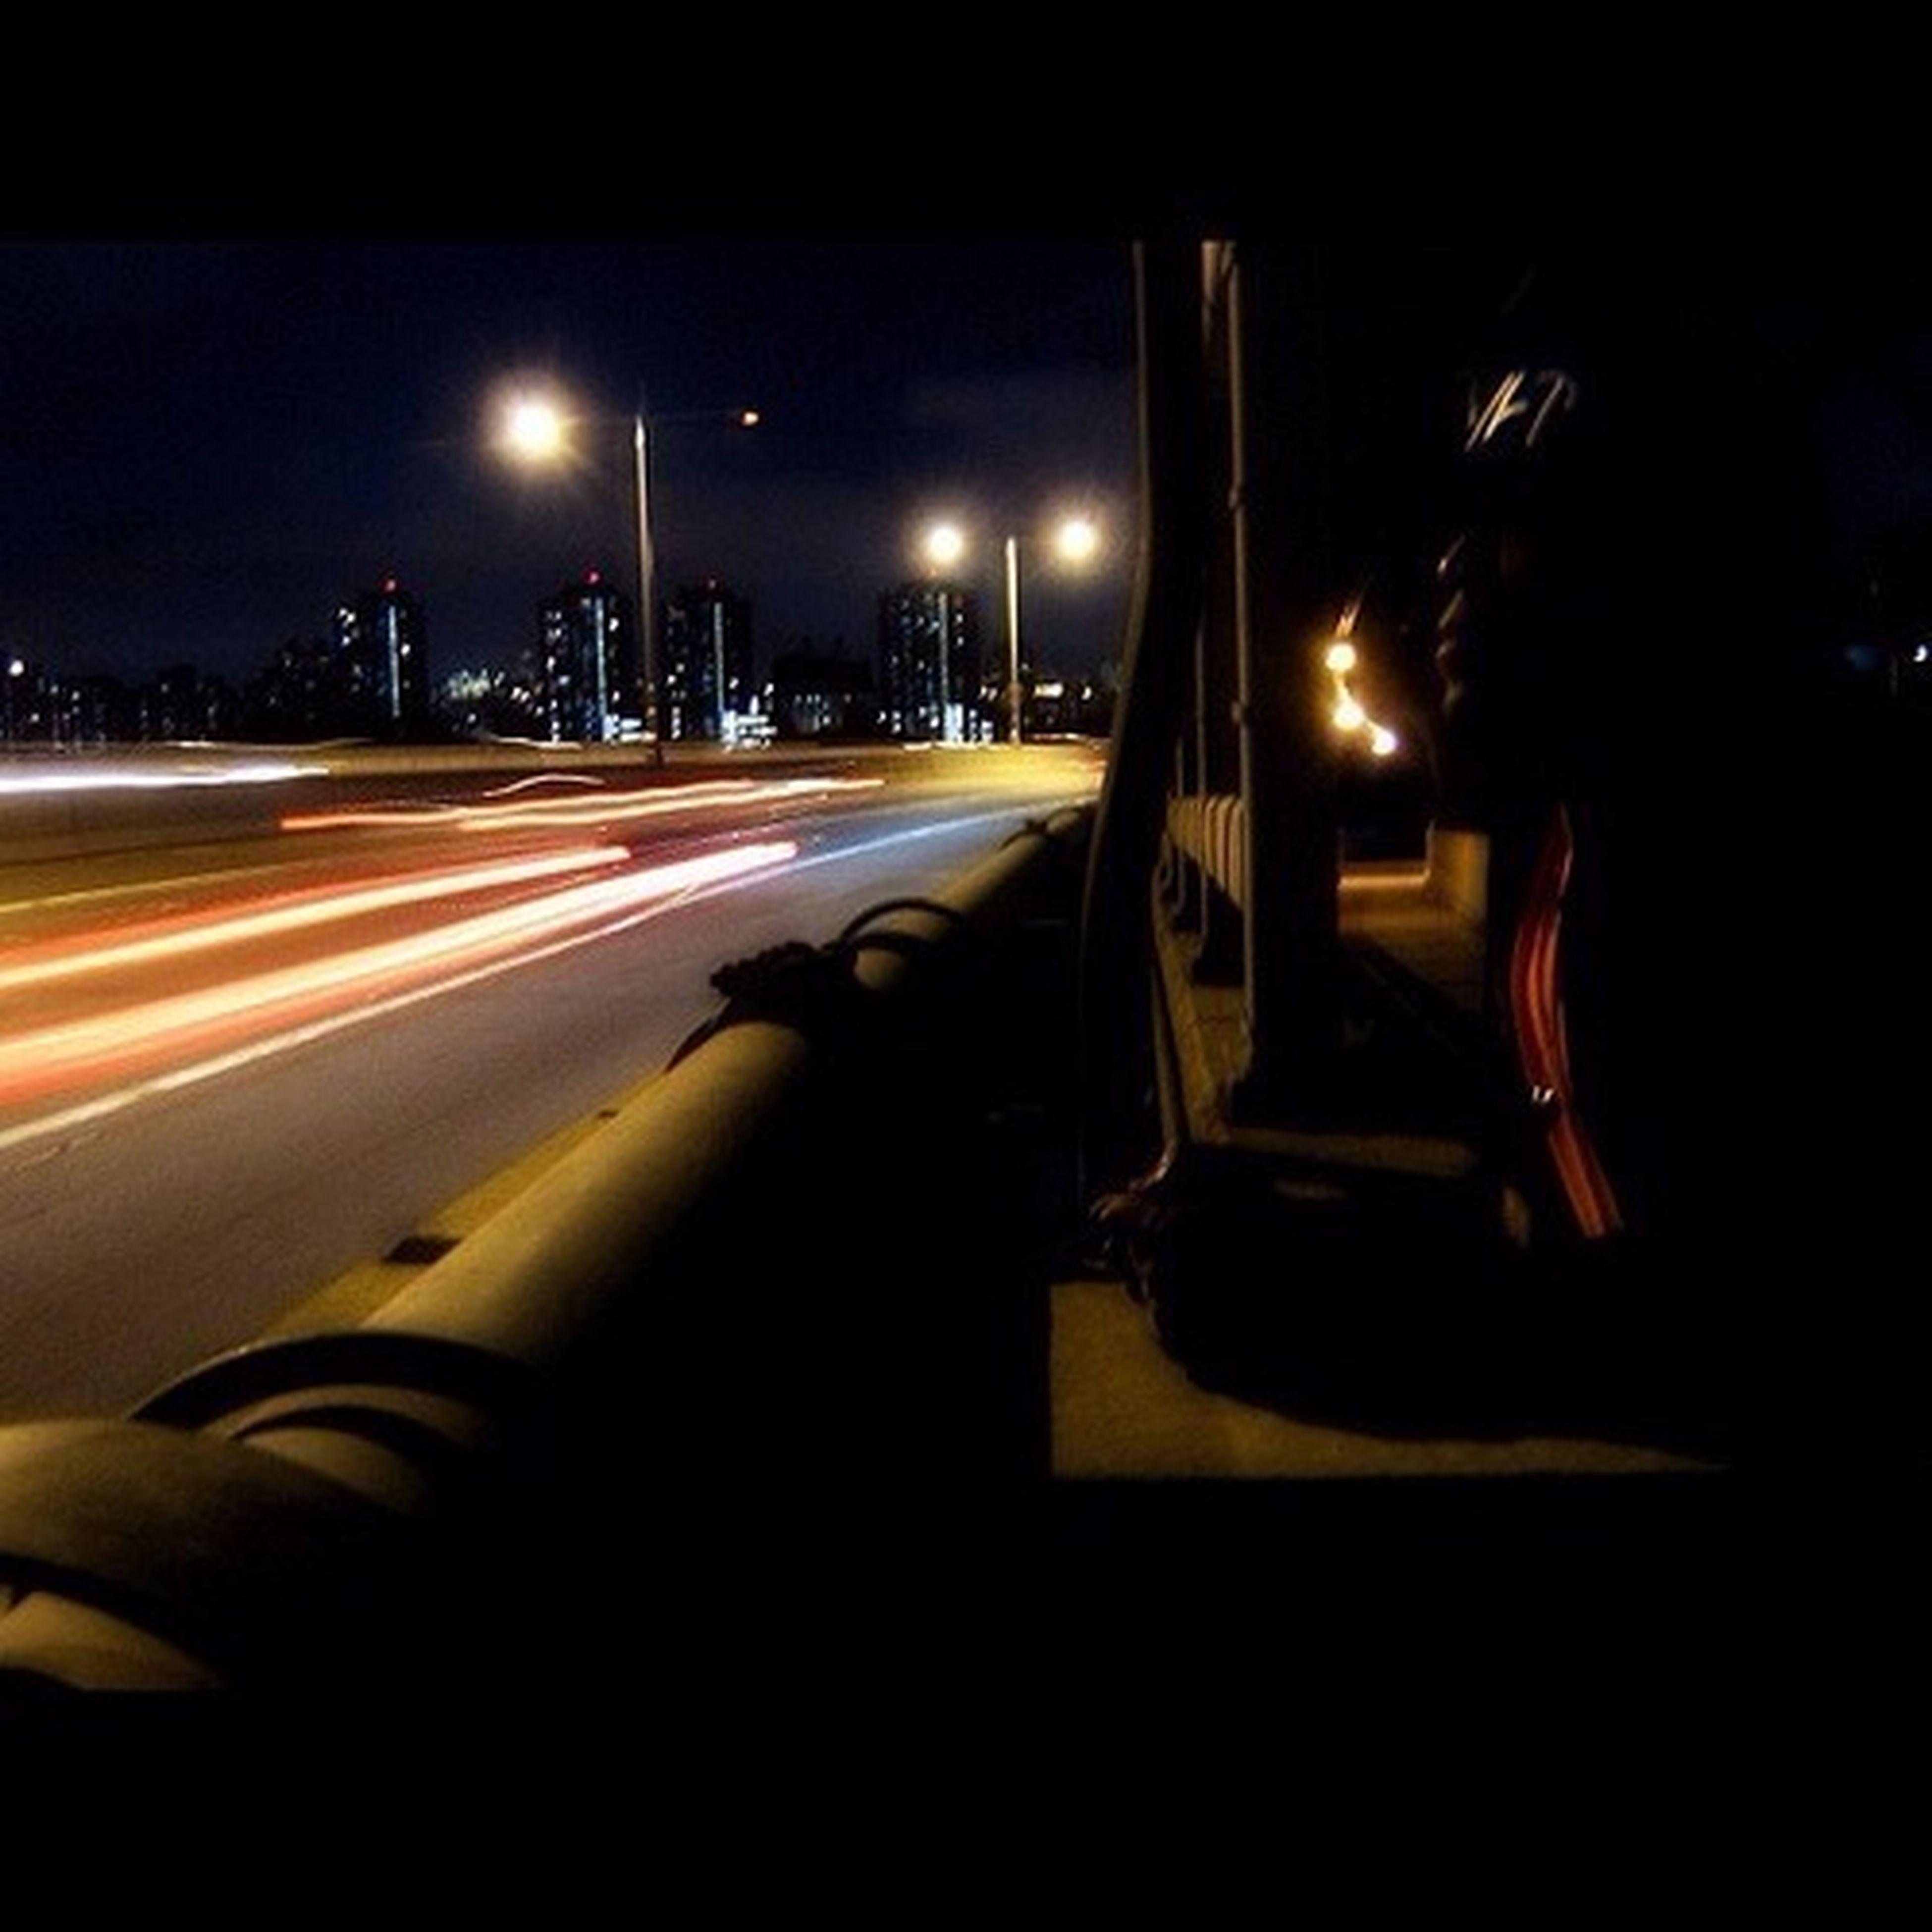 illuminated, night, transportation, street light, car, road, land vehicle, street, mode of transport, long exposure, light trail, motion, speed, on the move, traffic, sky, lighting equipment, road marking, blurred motion, city